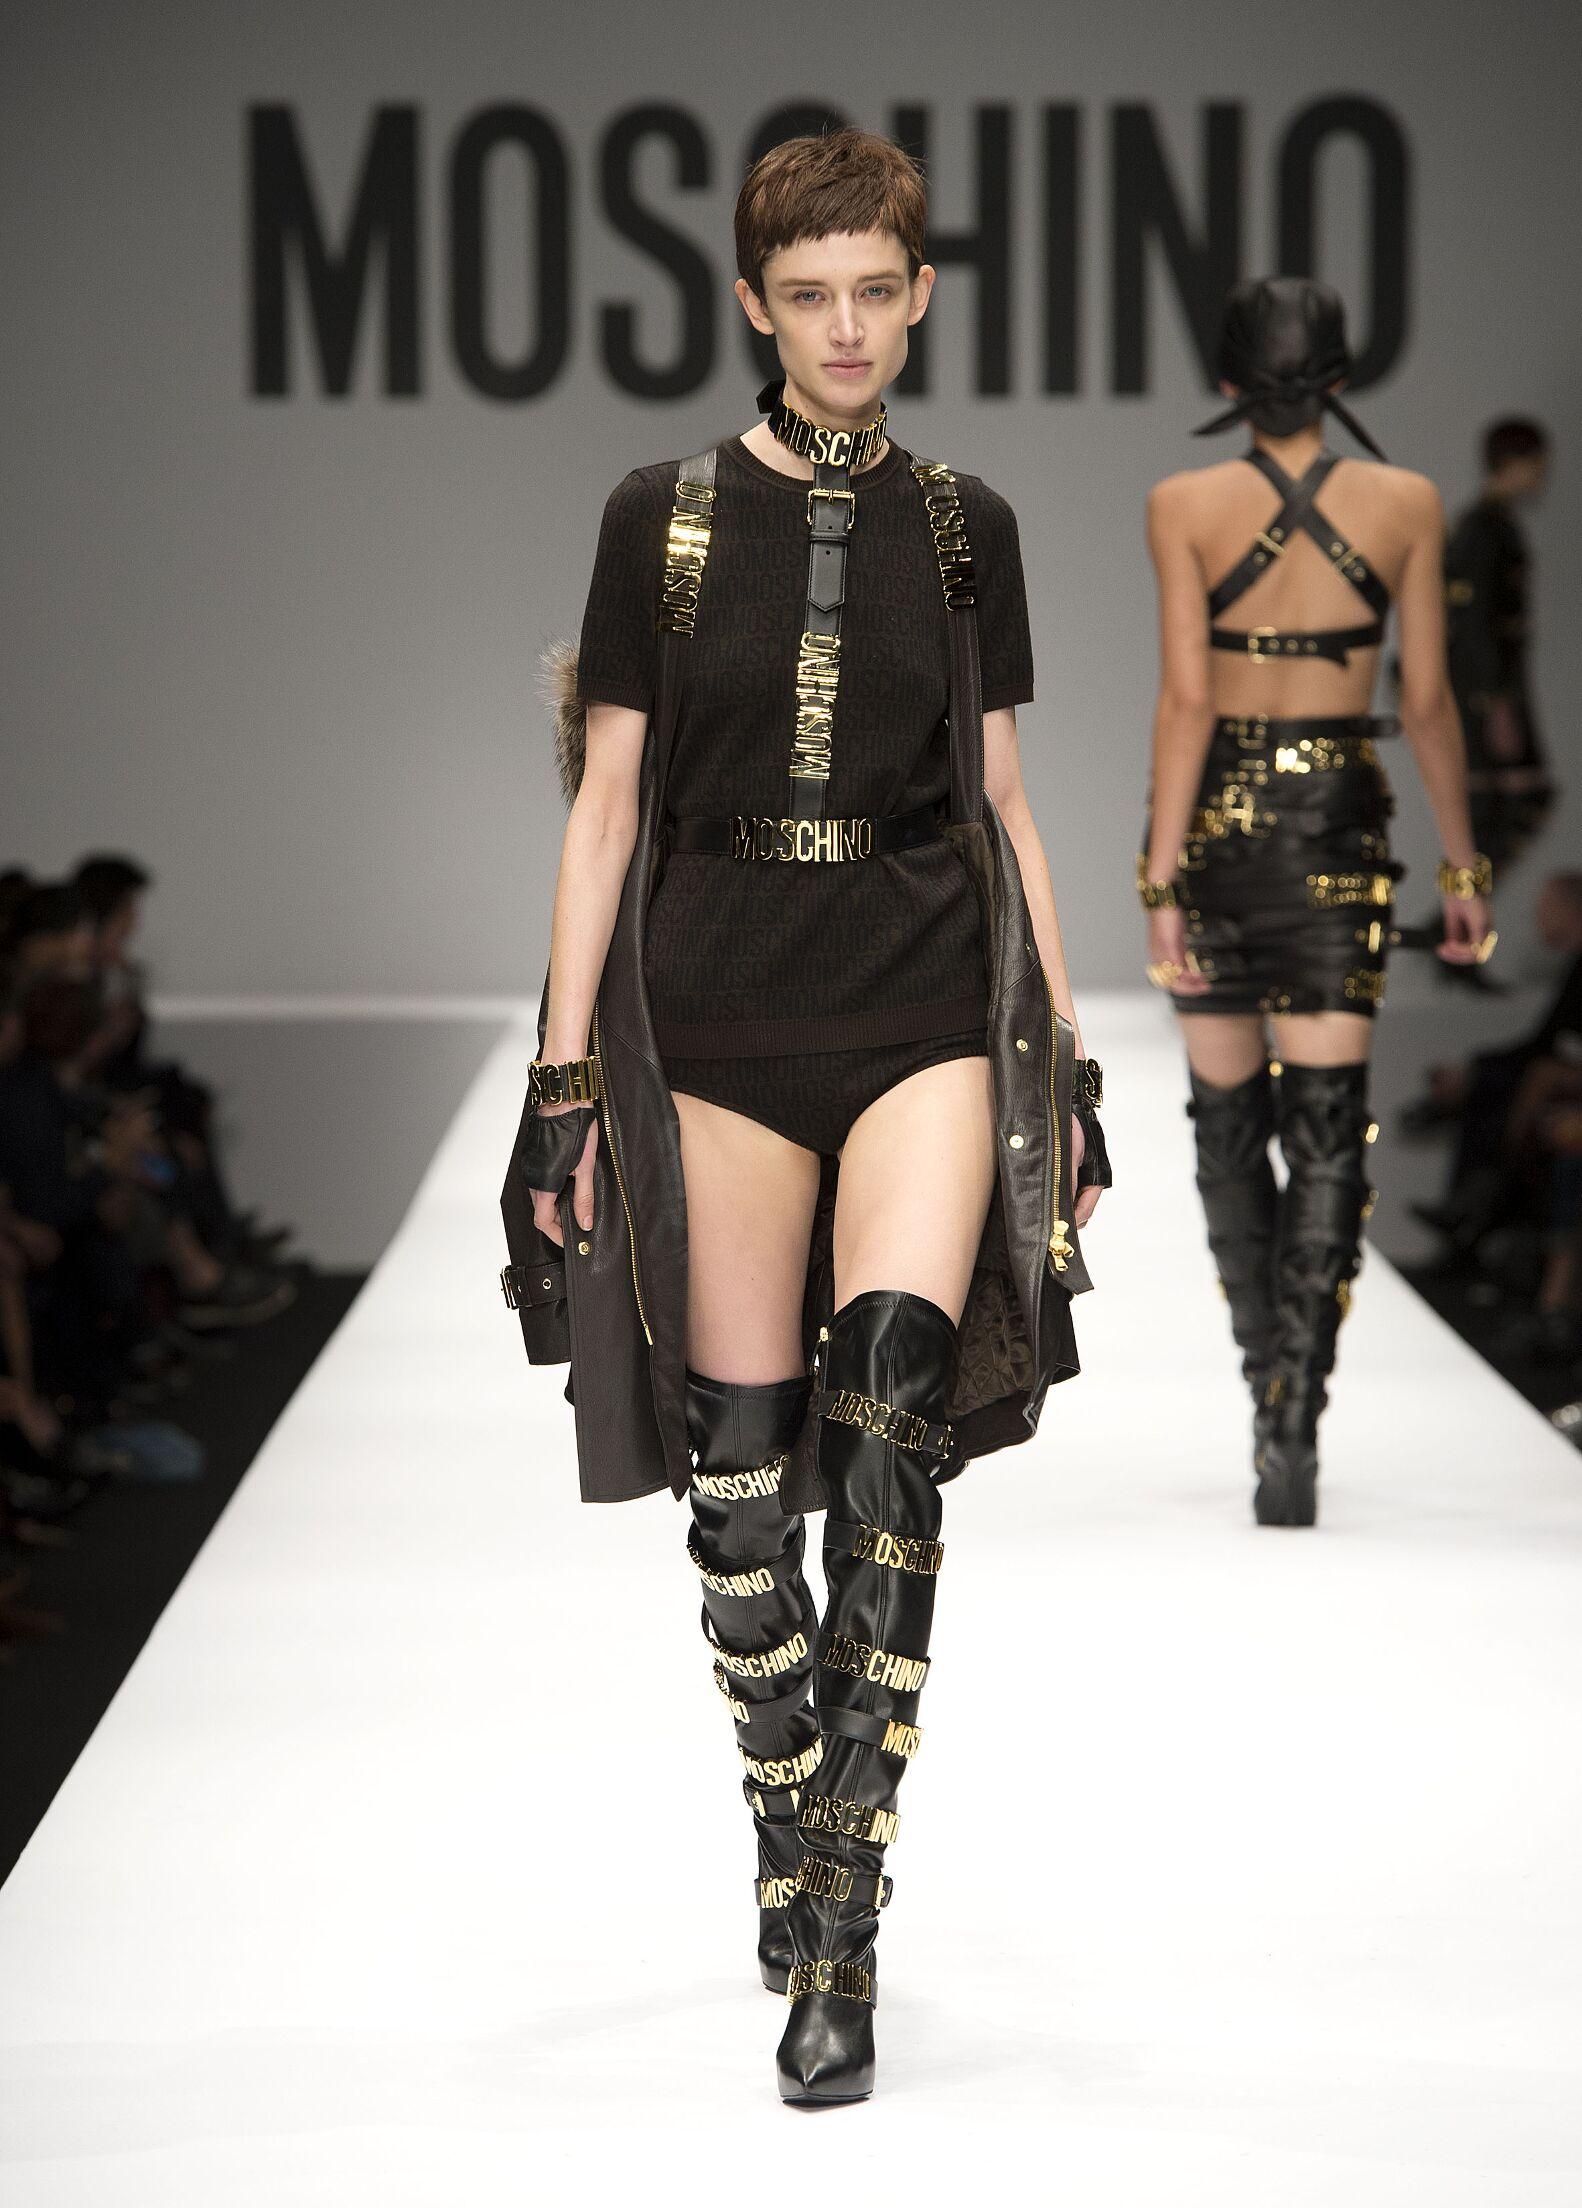 Winter Fashion Trends 2014 2015 Moschino